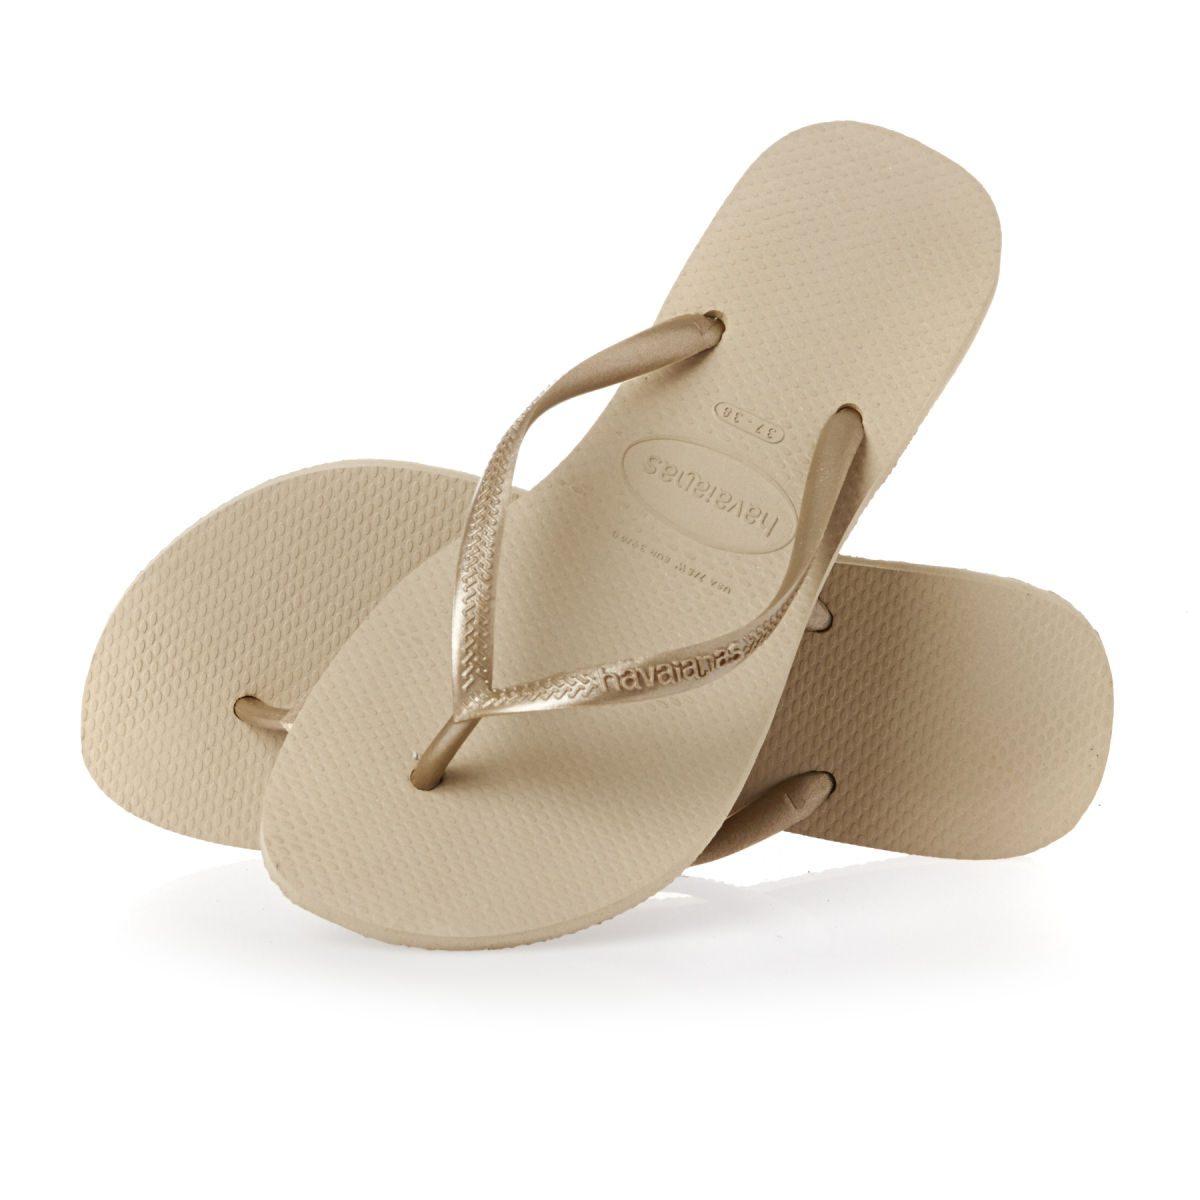 Havaianas Slim Flip Flop Sandal (Women) Image